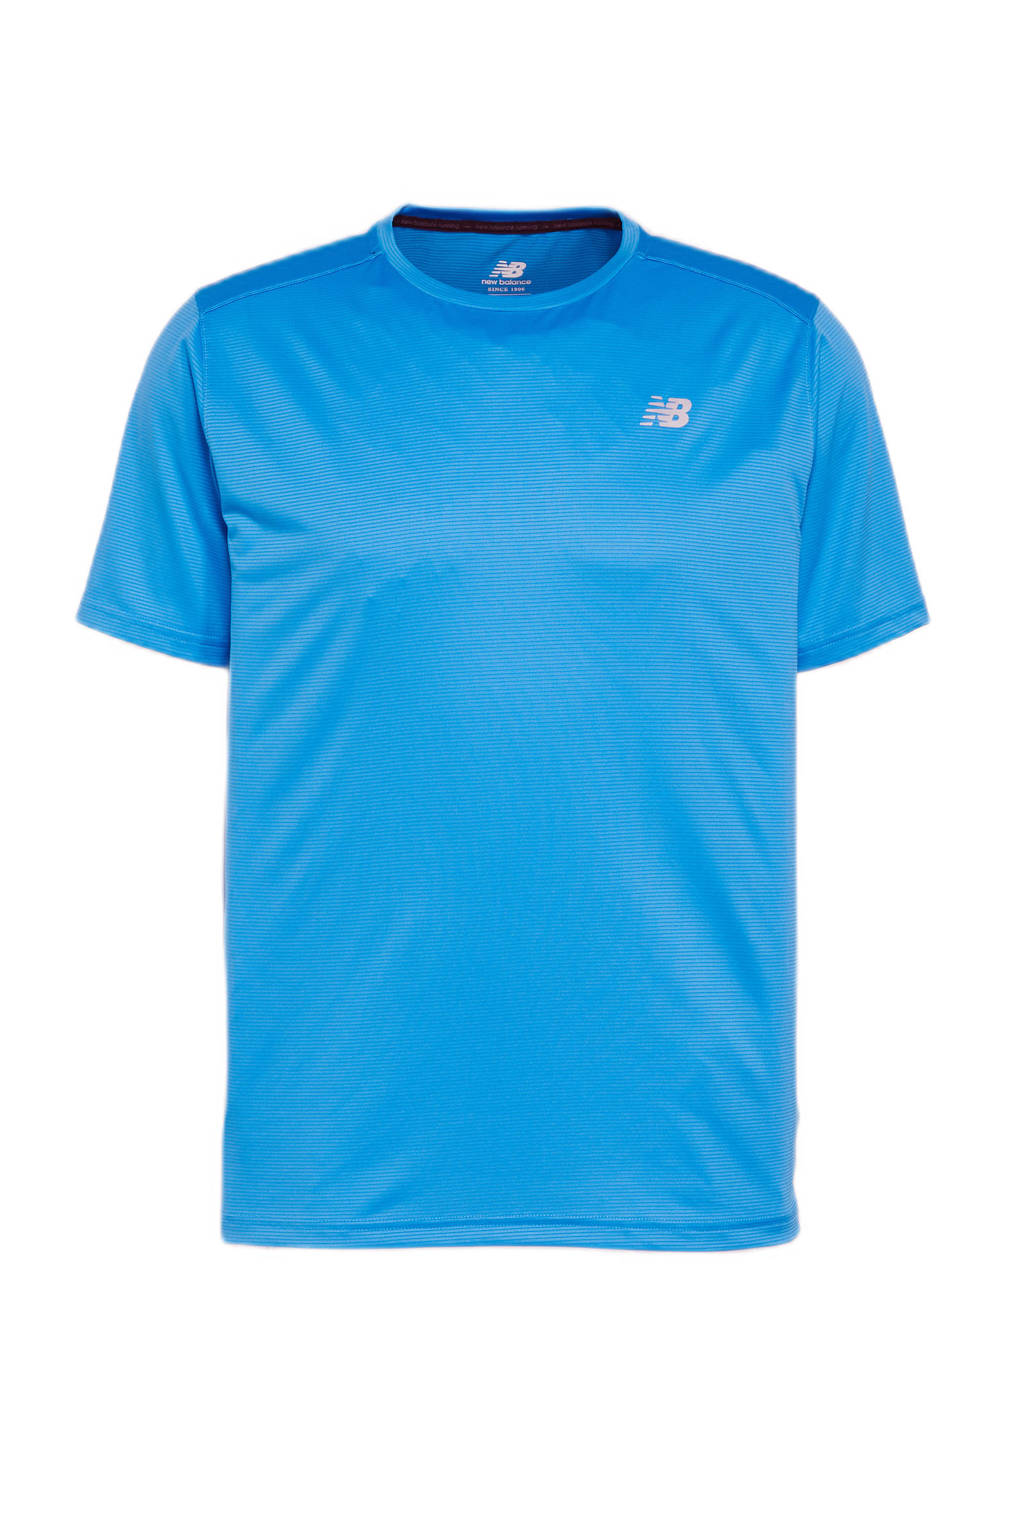 New Balance   sport T-shirt kobaltblauw, Kobaltblauw